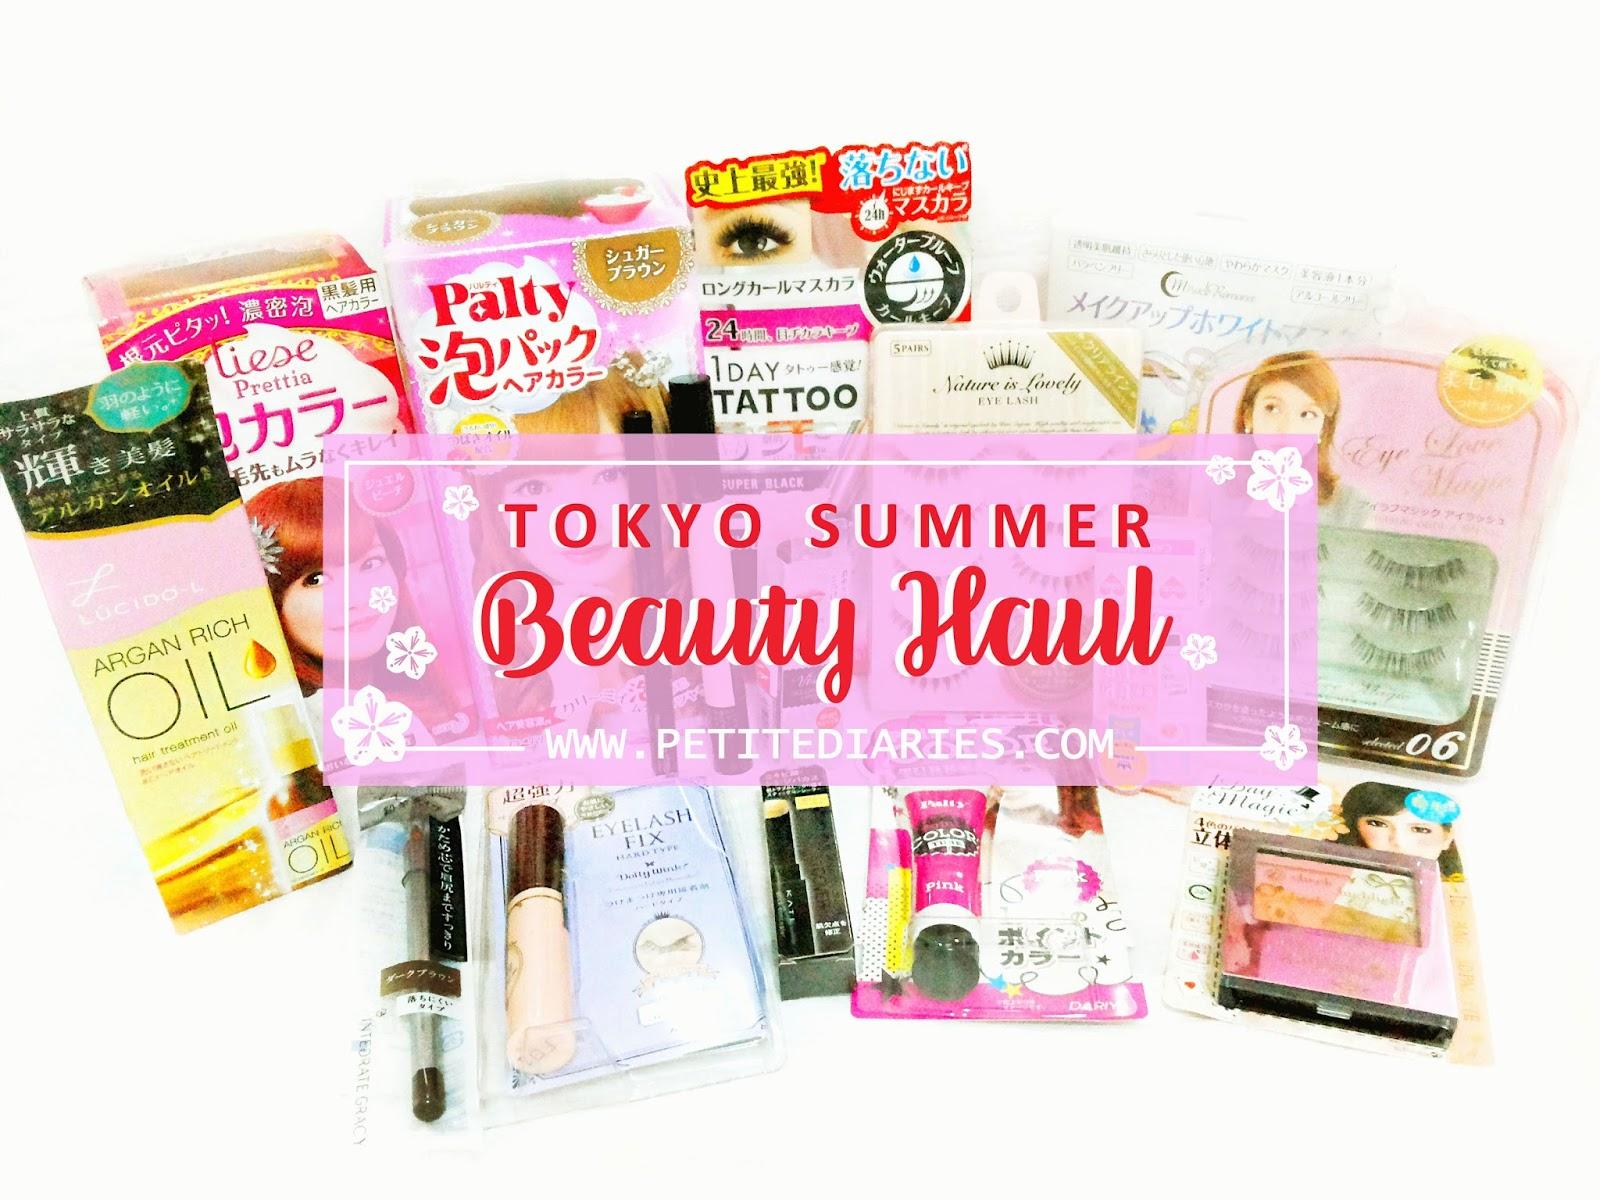 tokyo beauty haul petitediaries